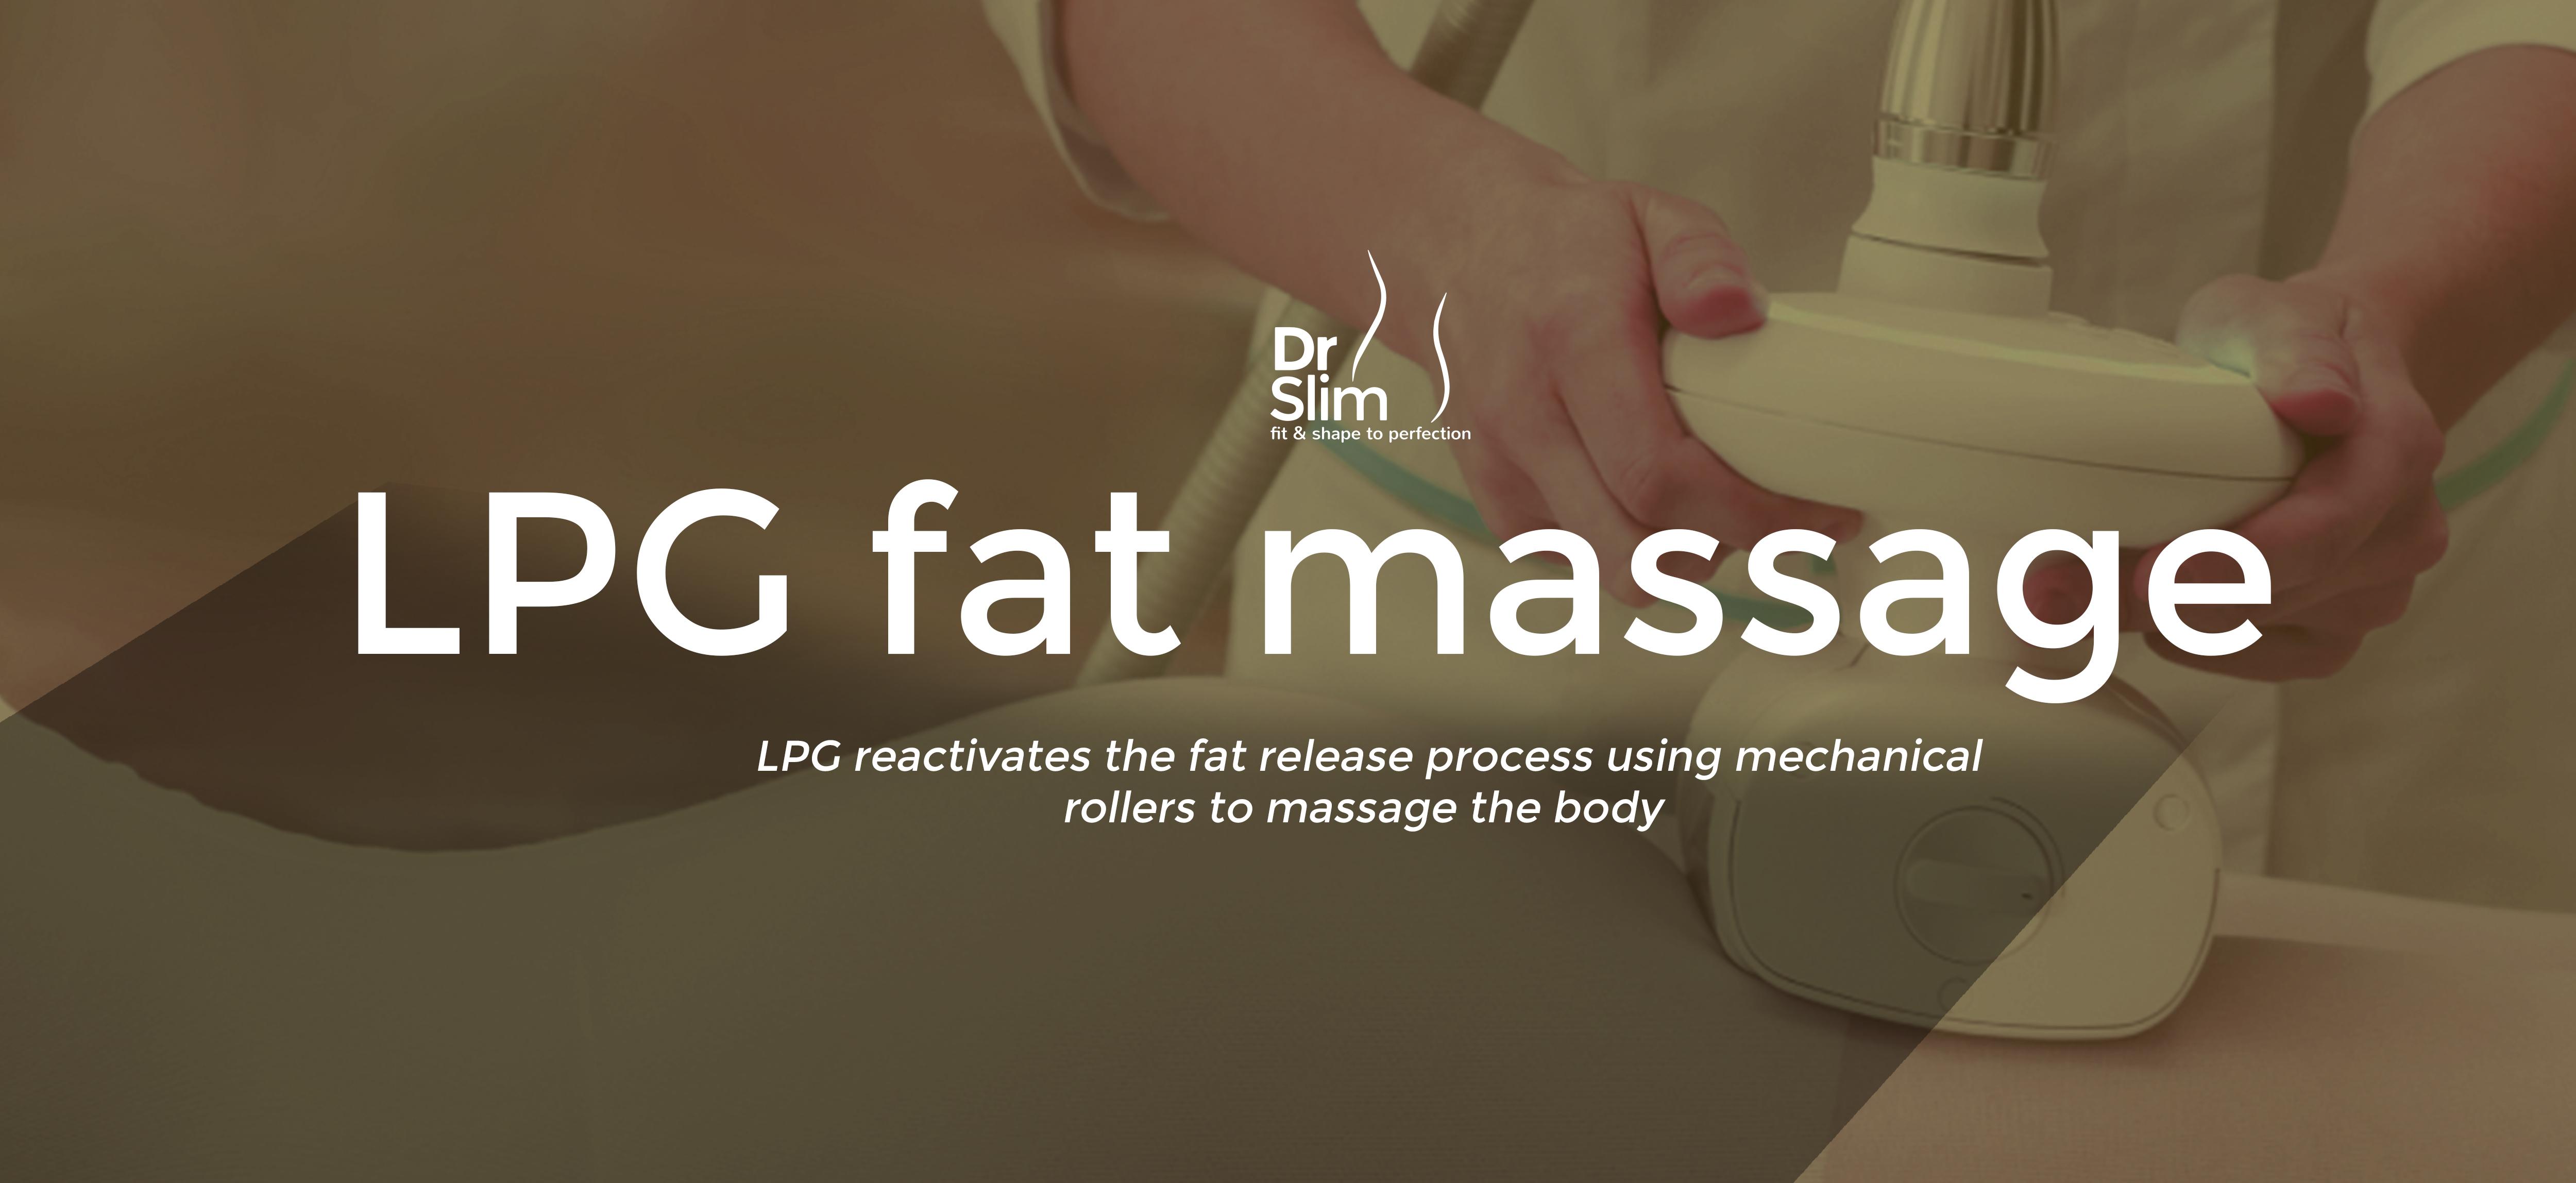 fat msg.JPG